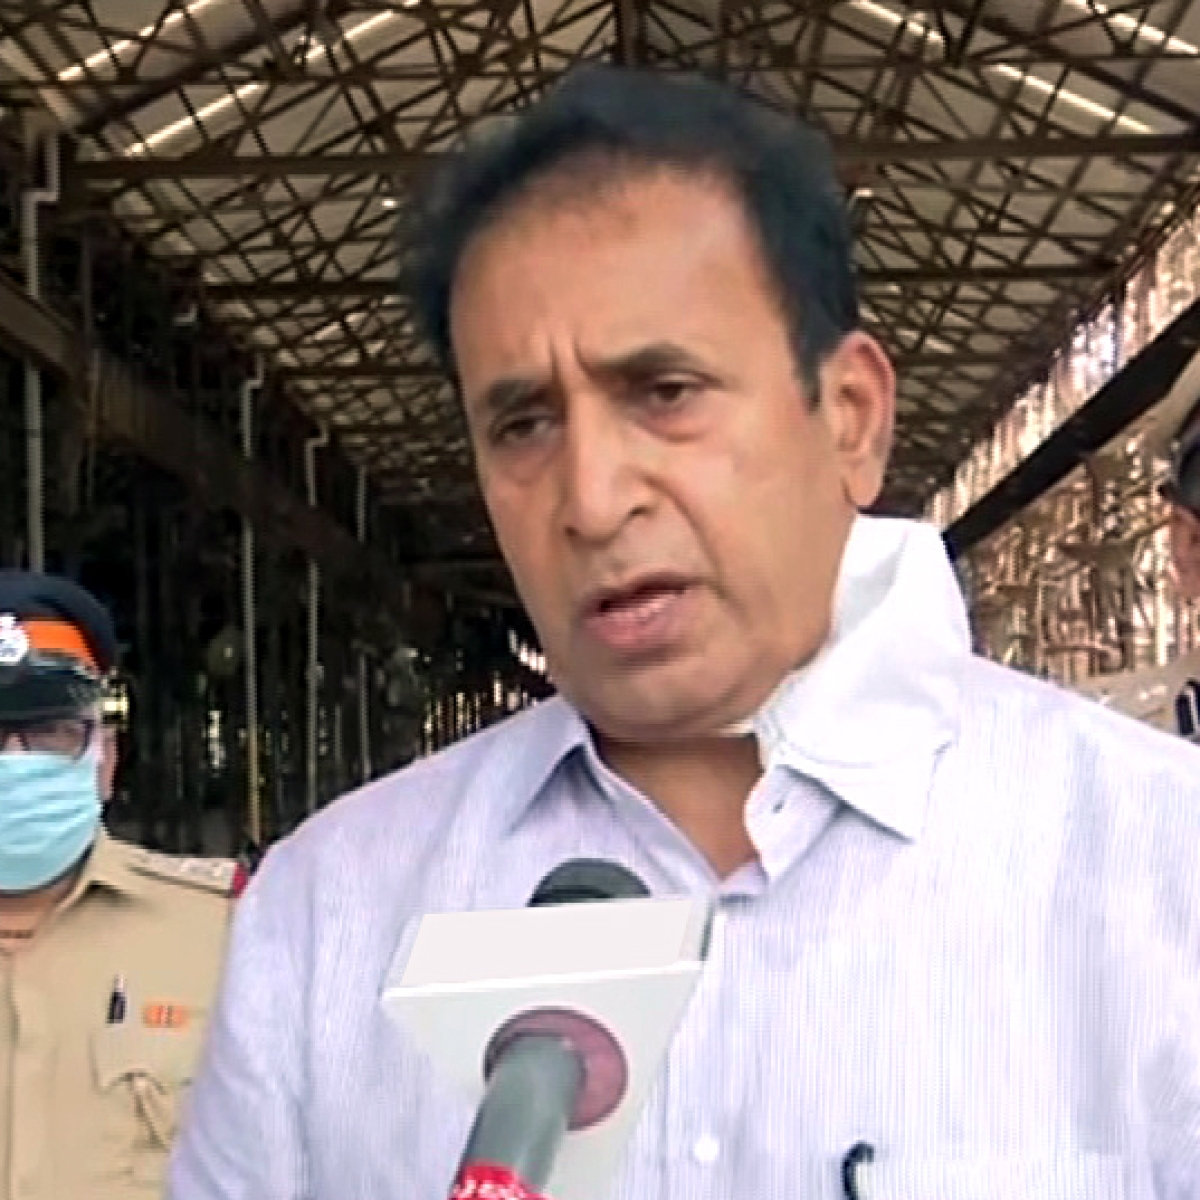 Mumbai: State committee yet to begin probe against former Home Minister Anil Deshmukh